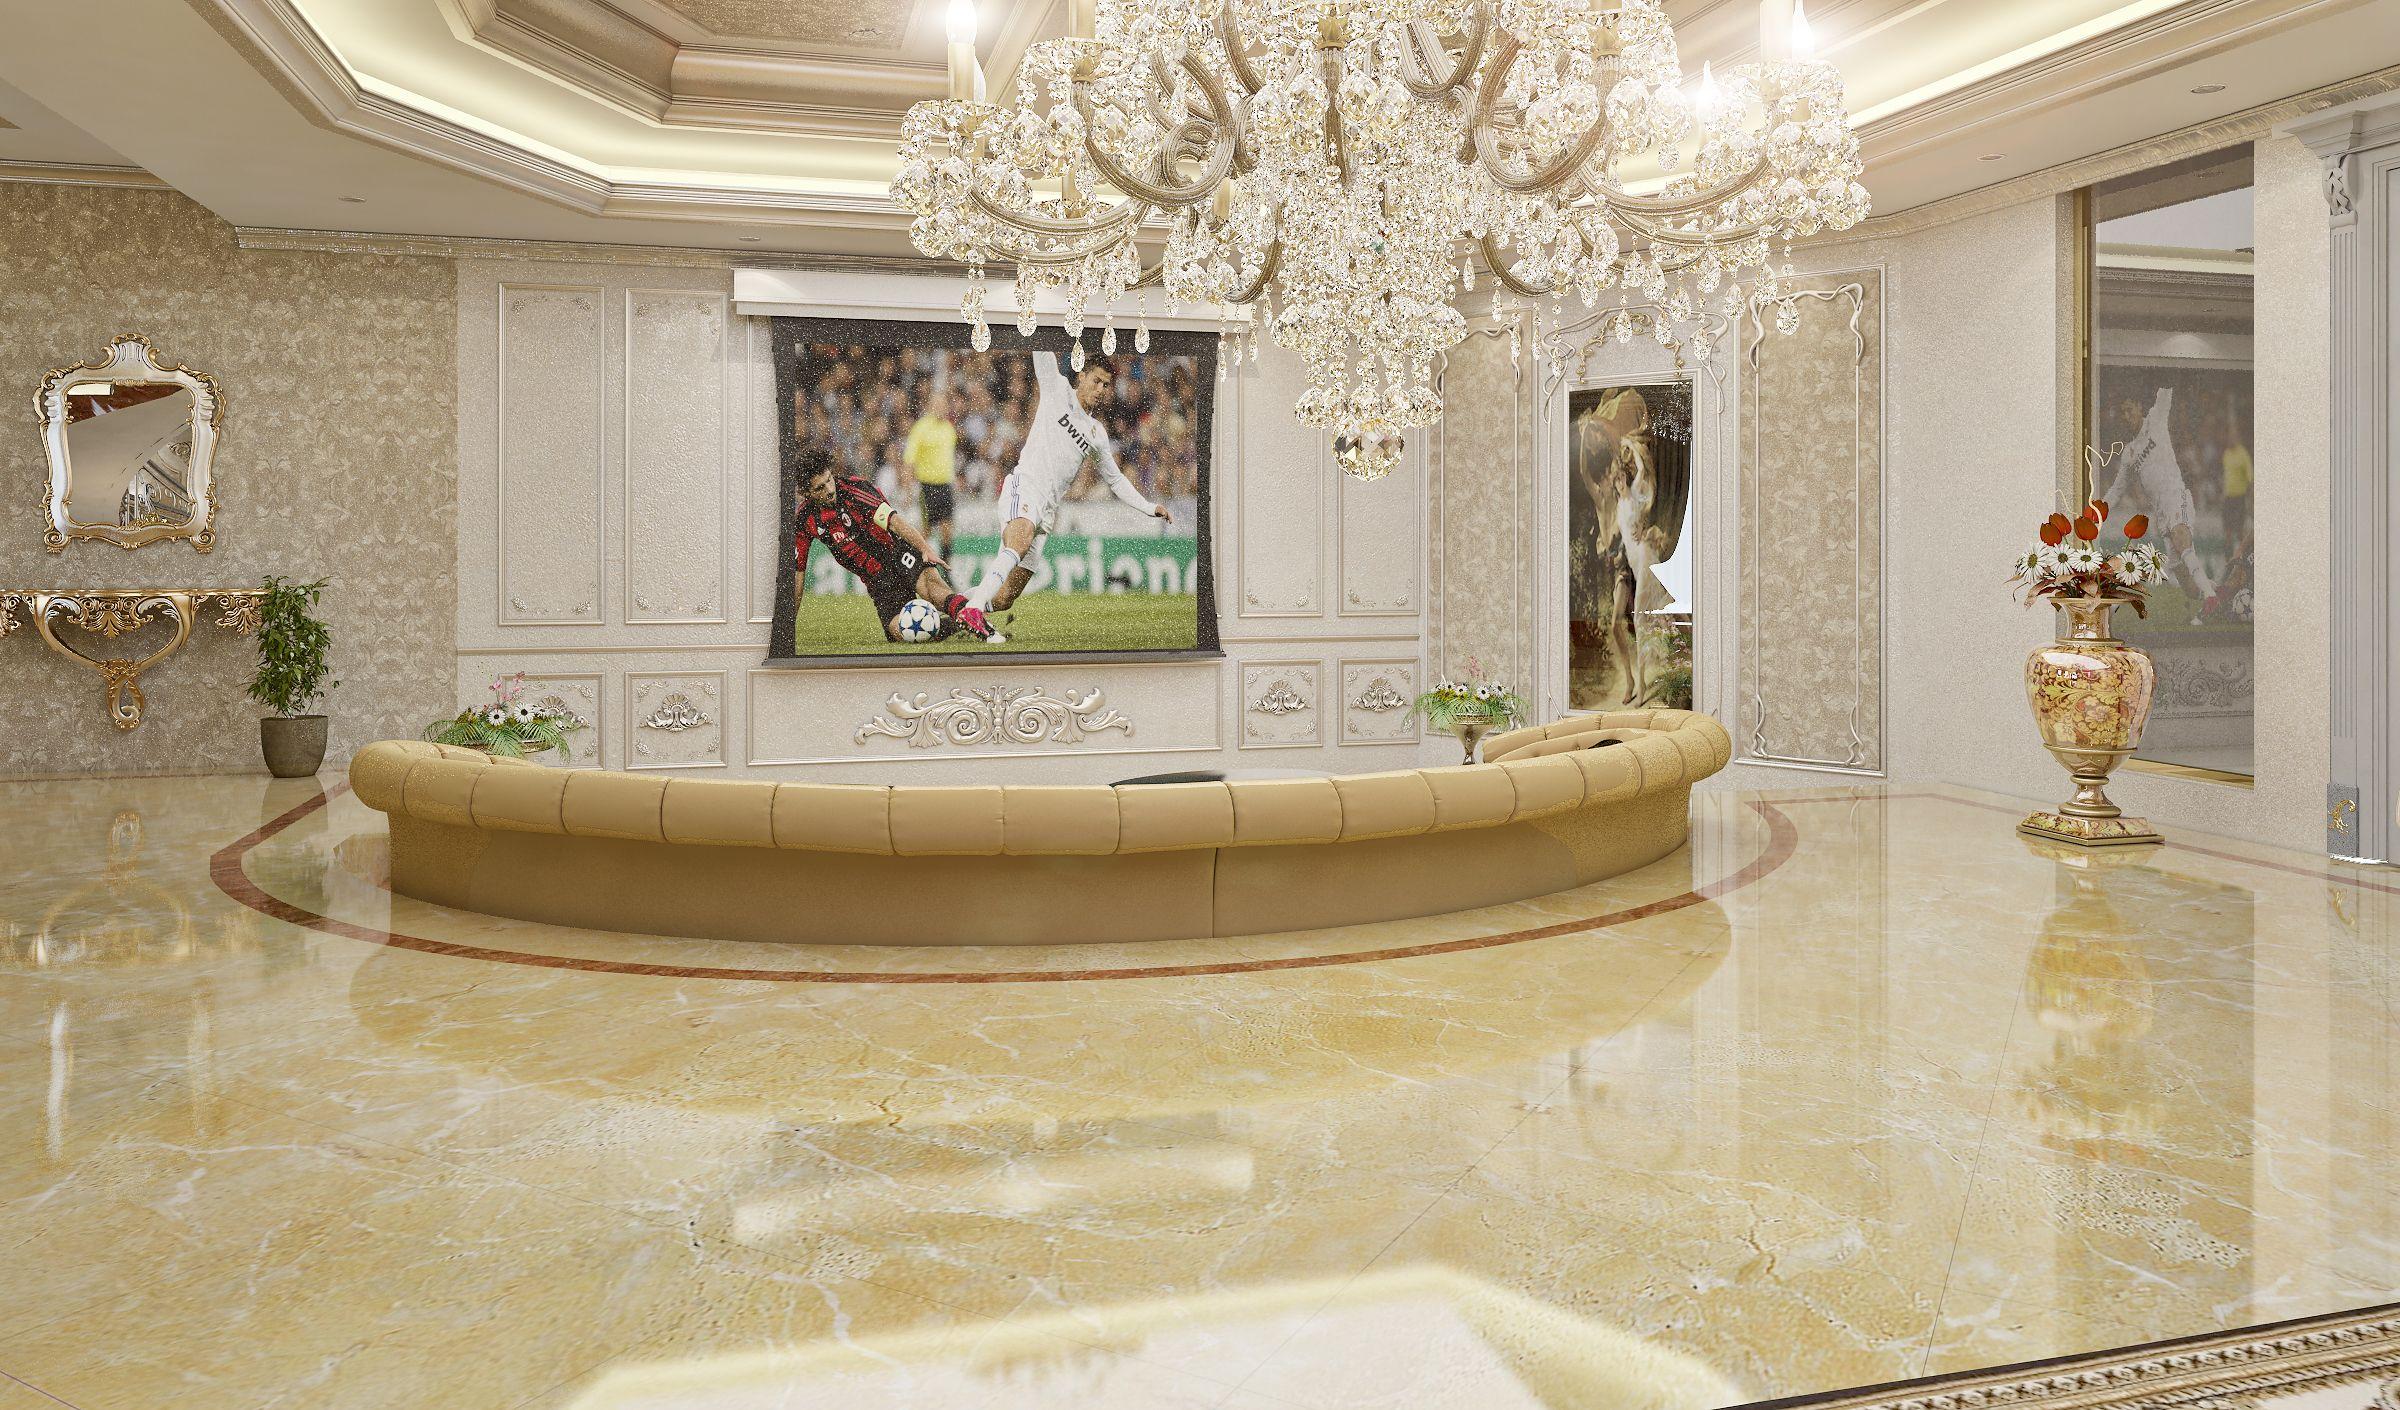 Khawaneej Villa Victorian Interior Dubai United Arab Emirates For More Details 971 4 4542907 052 720 8240 7 Victorian Interior Interior Decorating Decor